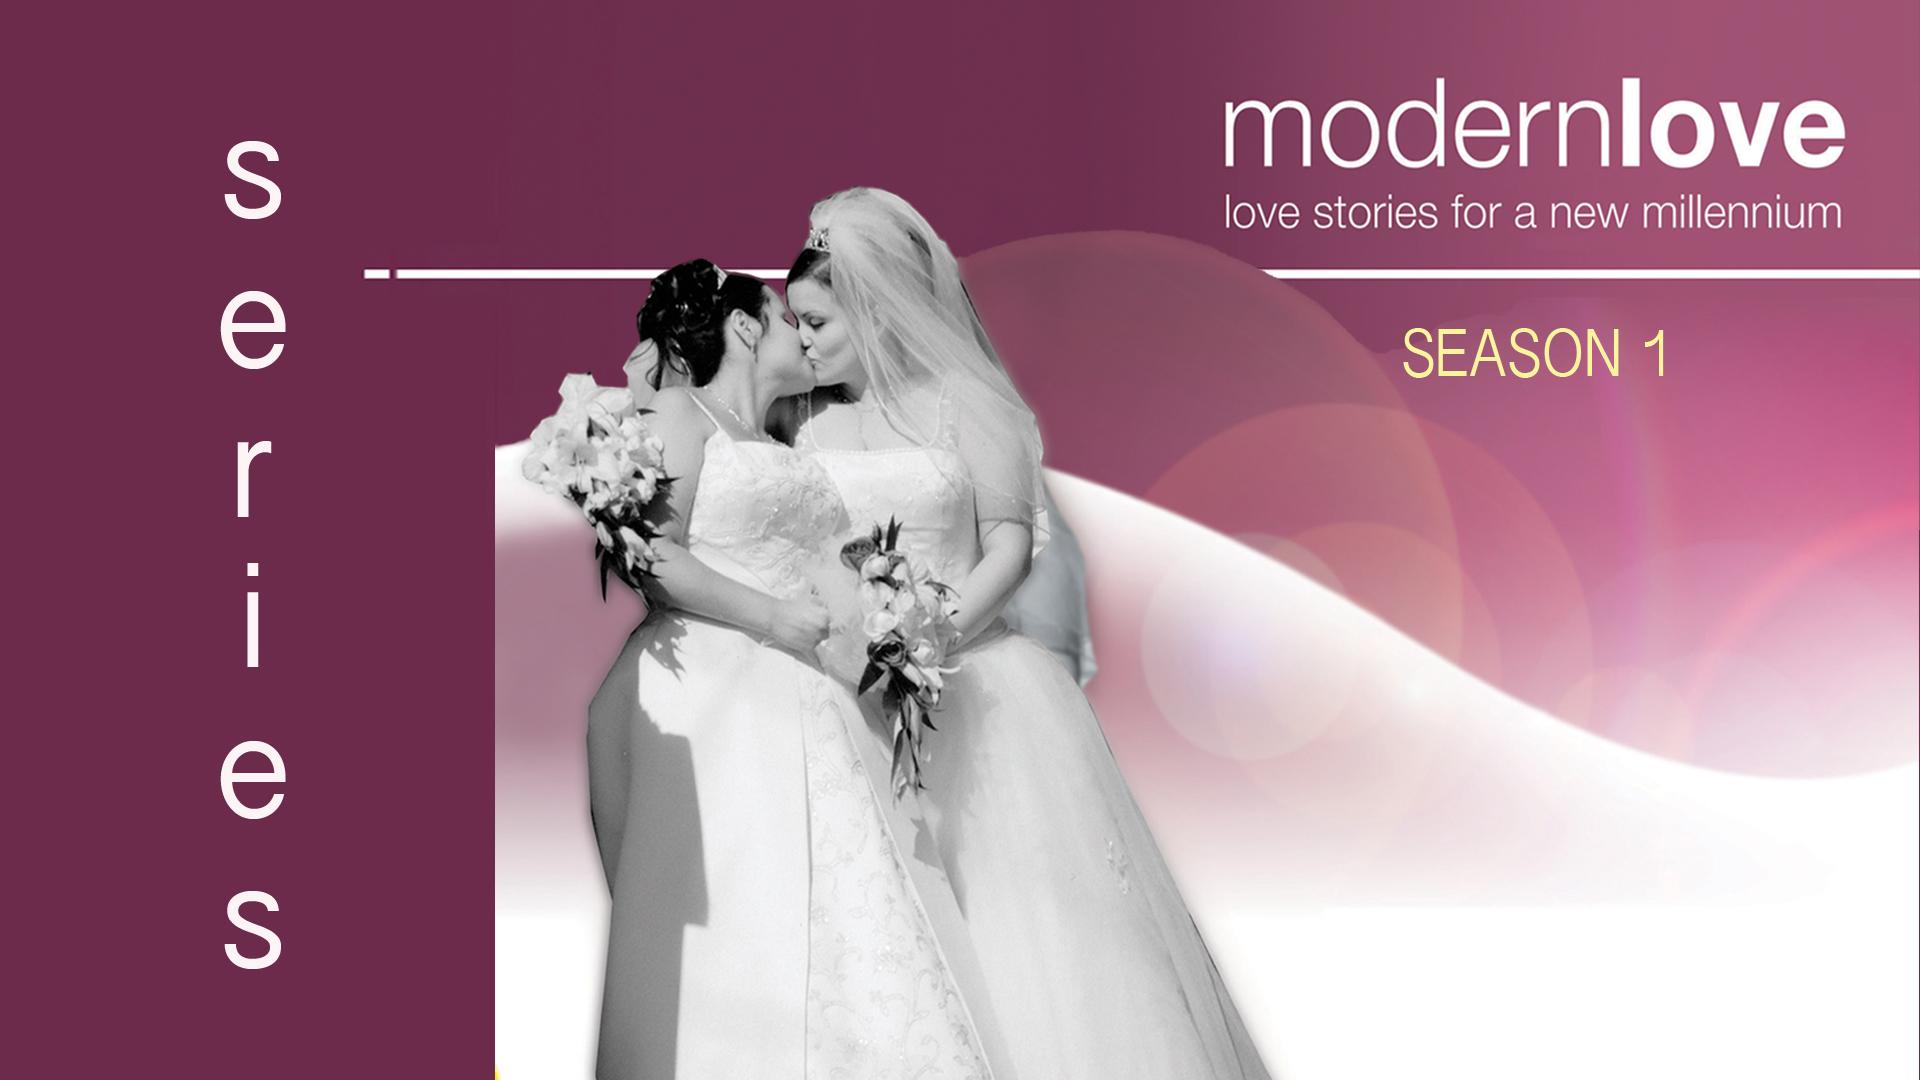 Modern Love Series: Love Stories For A New Millennium